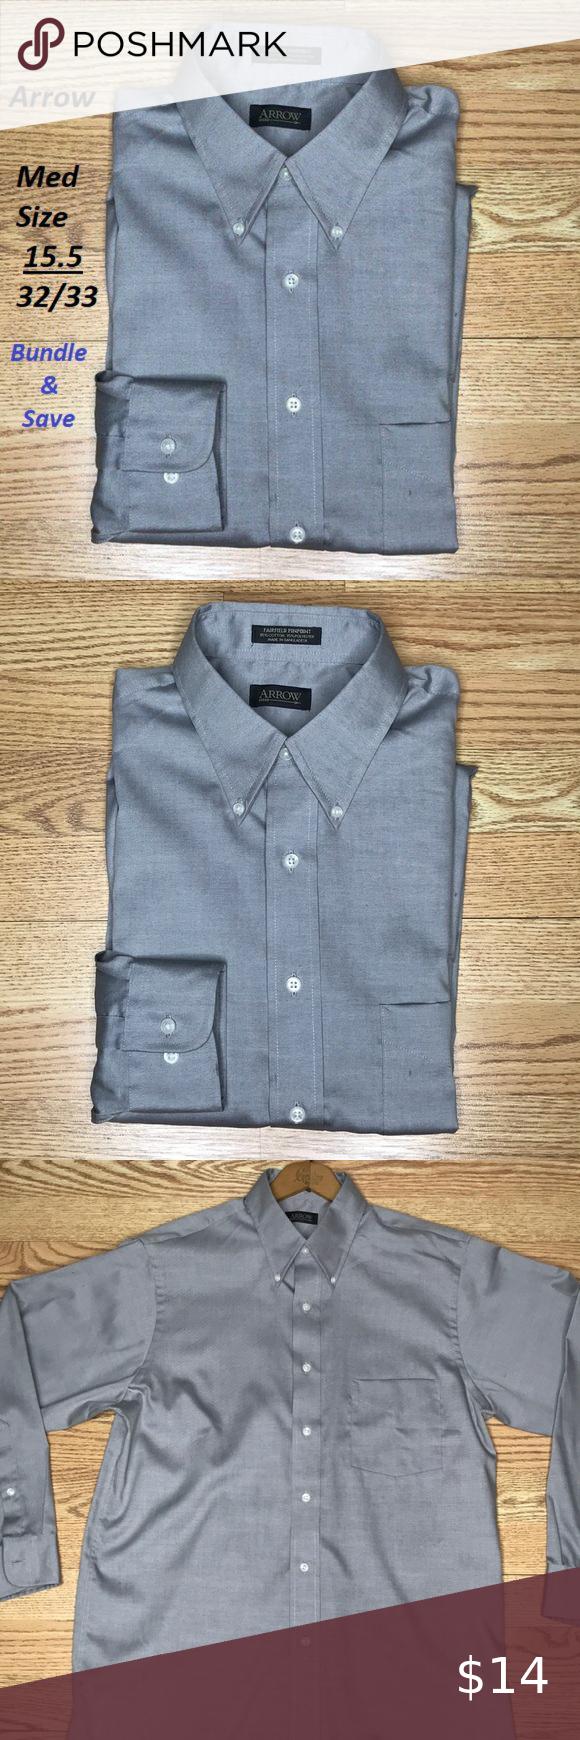 Arrow Grey Button Down M 15 1 2 32 33 Mens Shirt Dress Clothes Design Long Sleeve Shirts